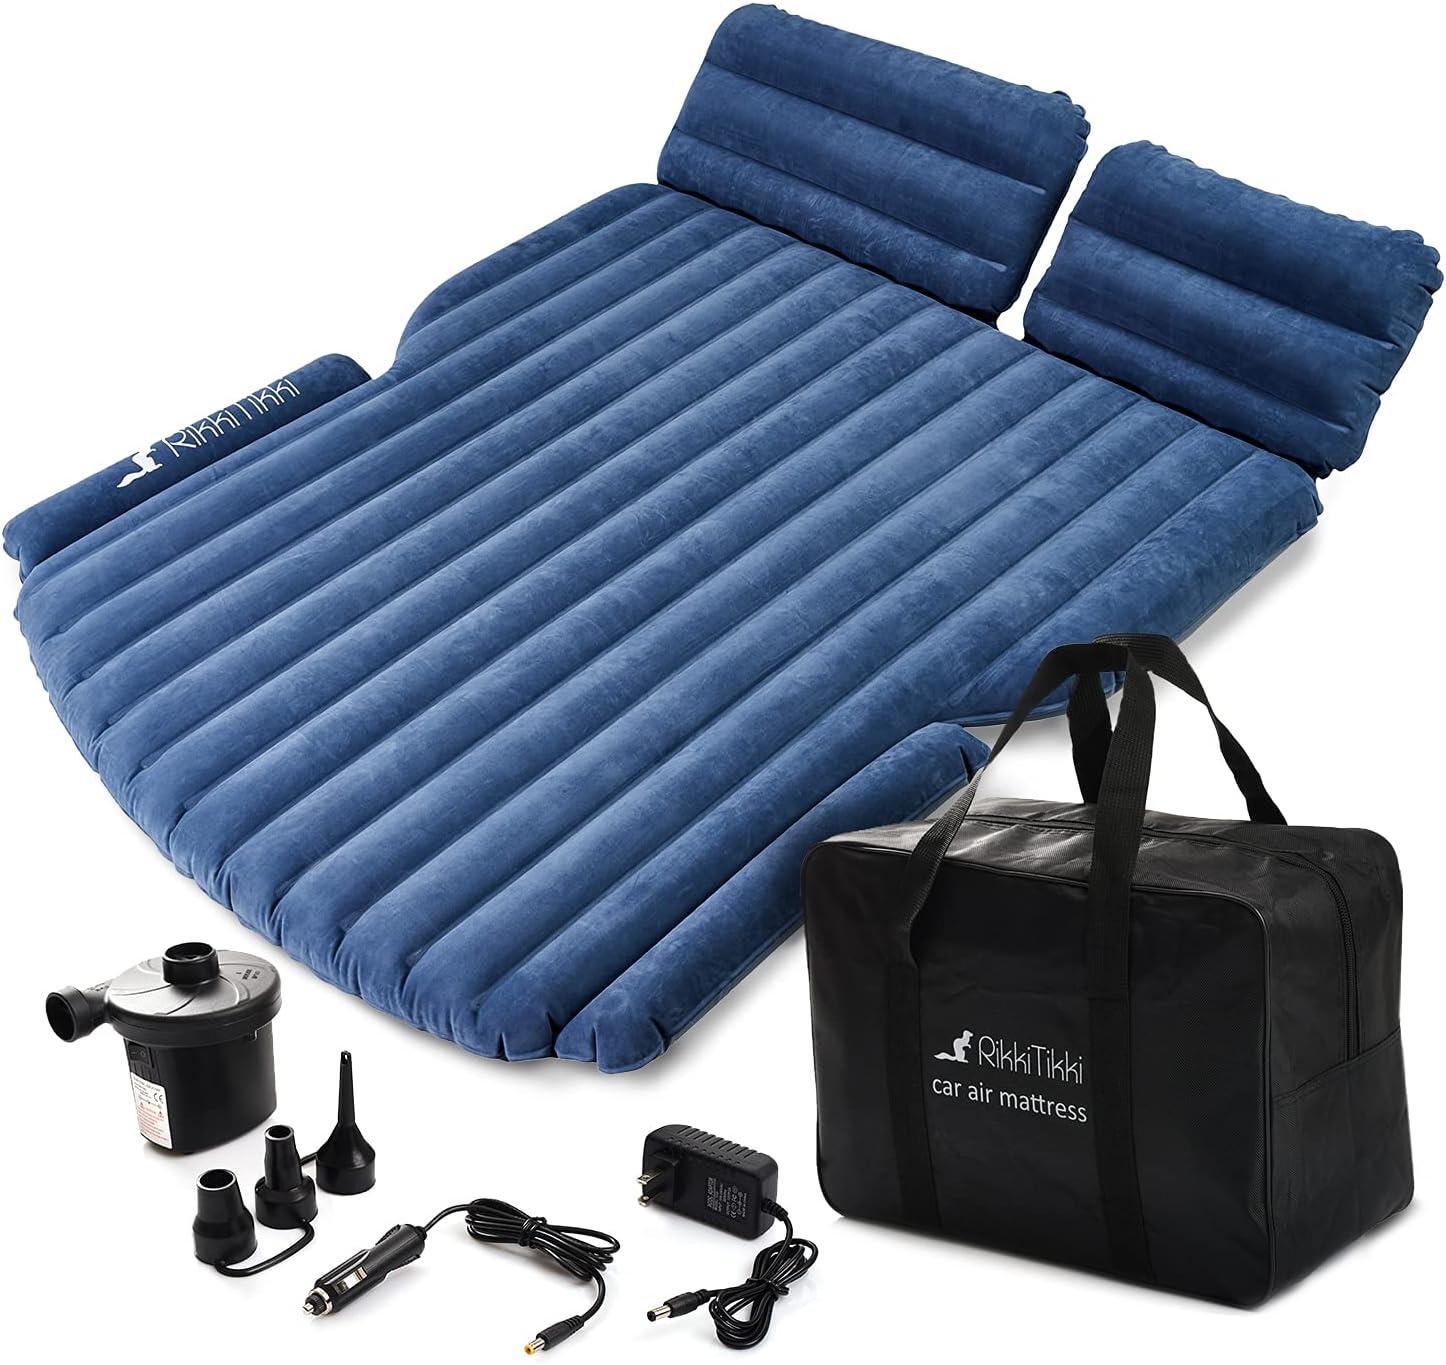 Inflatable Car Air Mattress Compact Twin Size Vacation Camping Minivan SUV Truck Portable Travel Back Seat Blow-Up Sleeping Pad